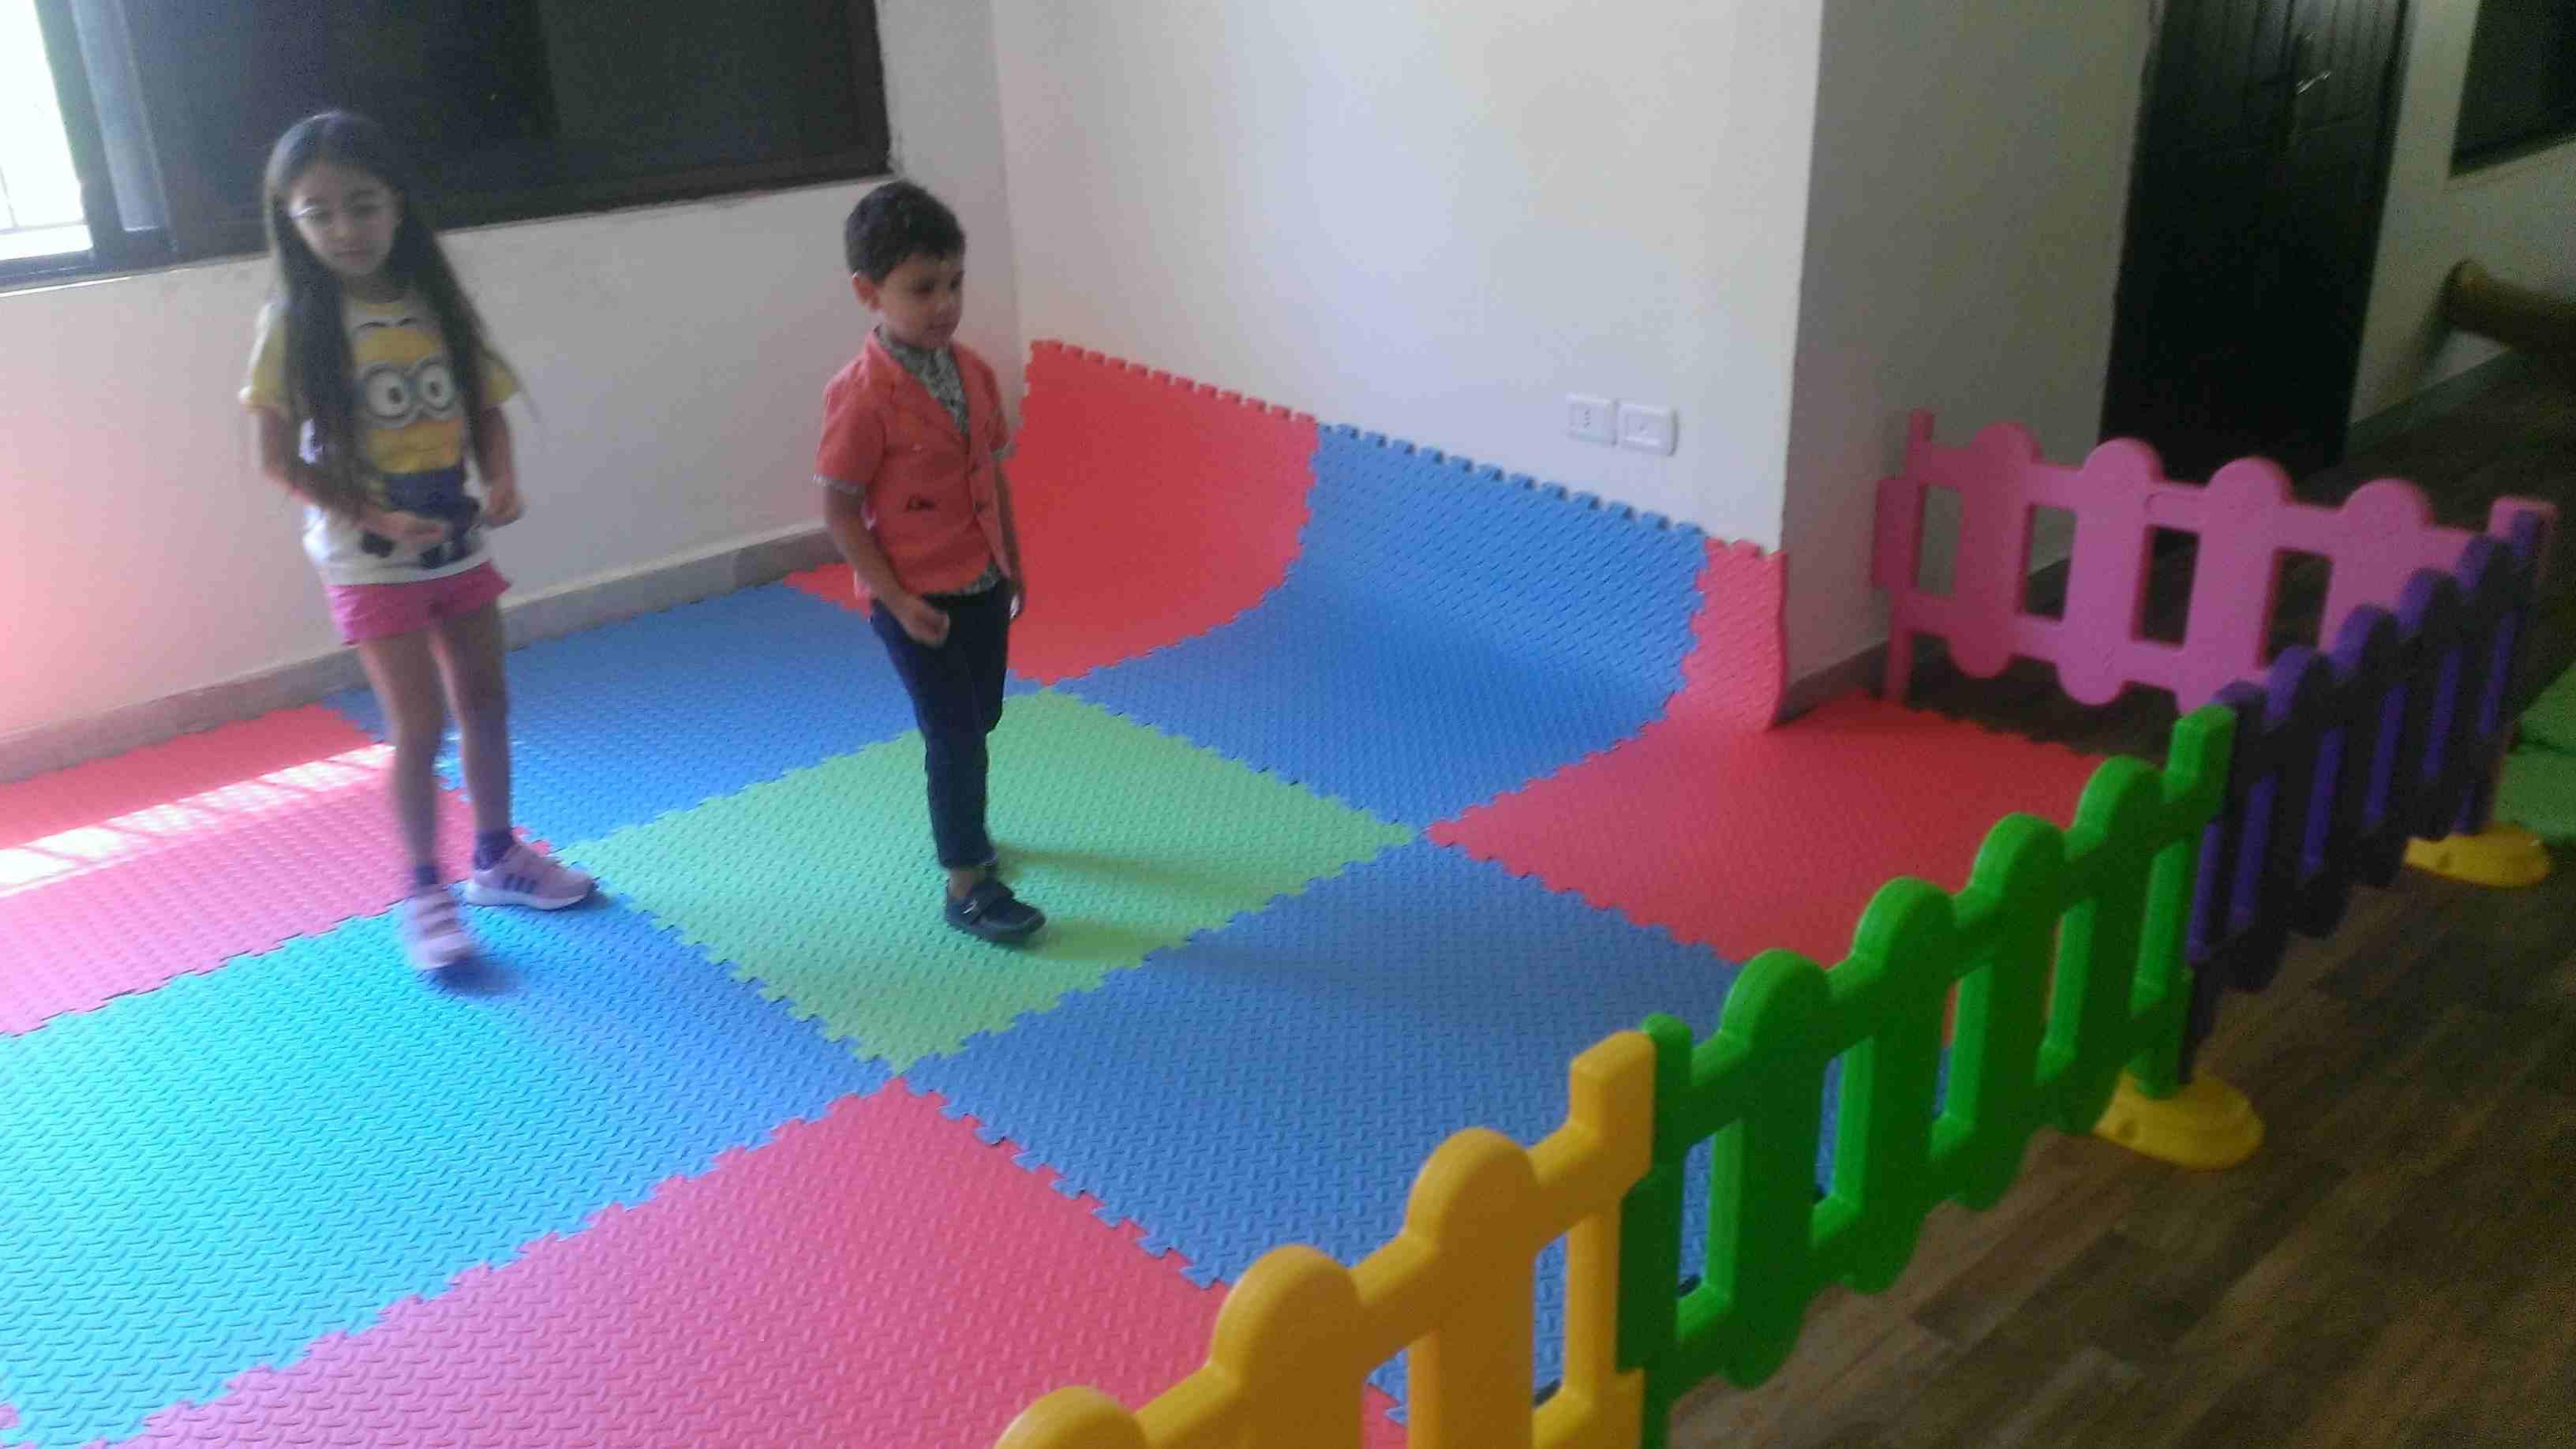 Toys for kids-  حواجز وقواطع بلاستيكية...